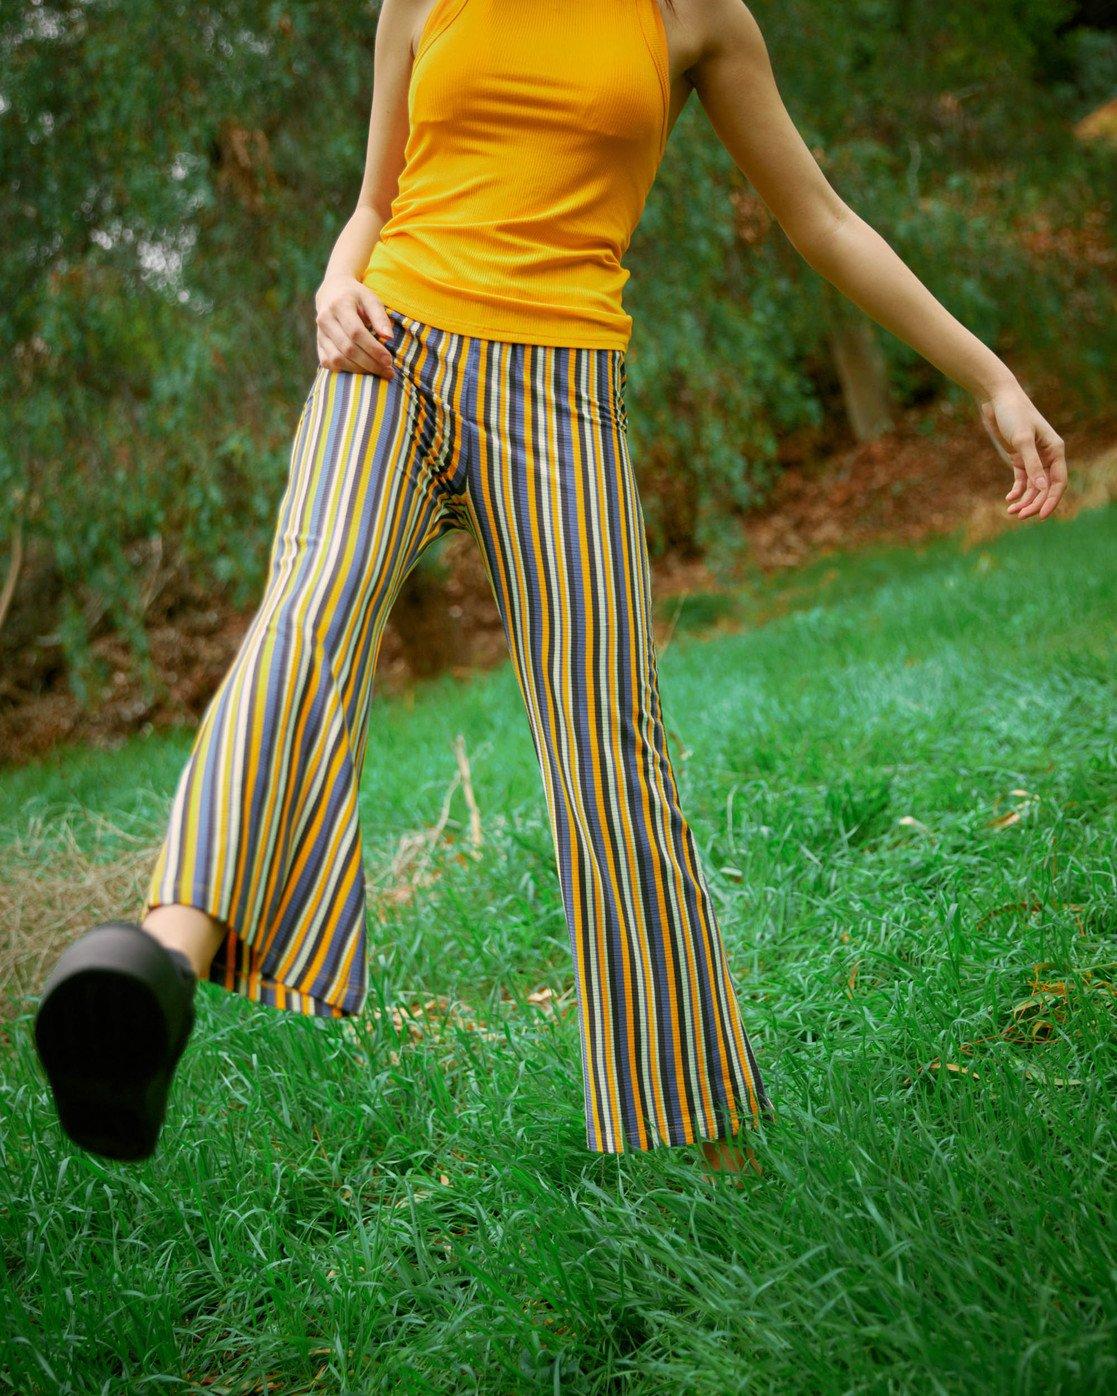 1 Kickback Pant Yellow AVJNP00127 RVCA